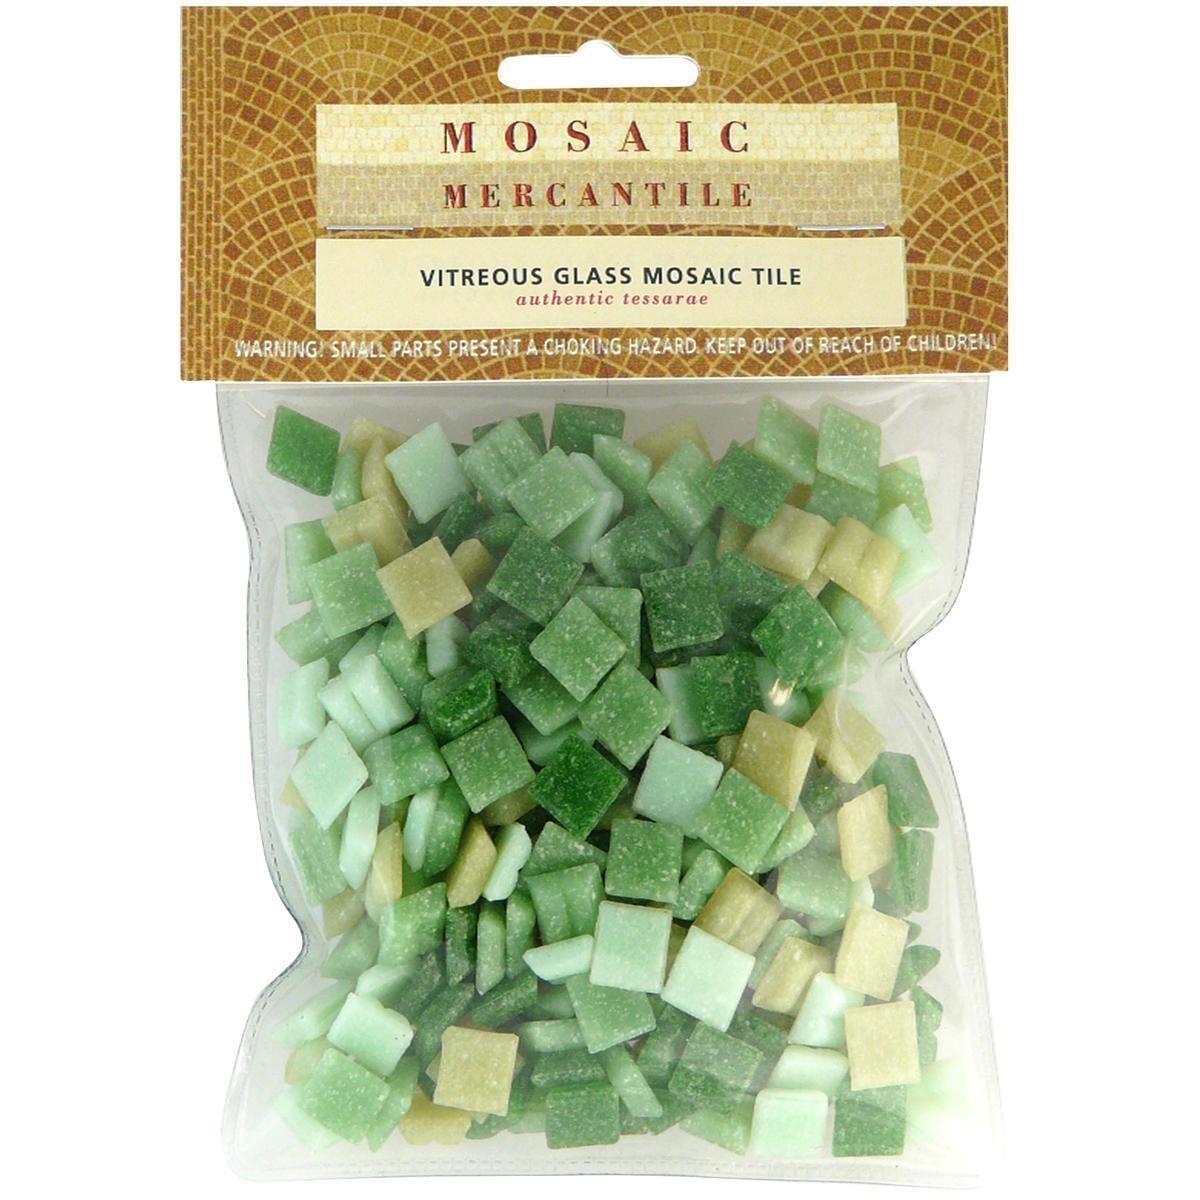 MOSAIC Mercantile 3/8 Mini Mosaic Mix 1/2 Pound - Landsca...